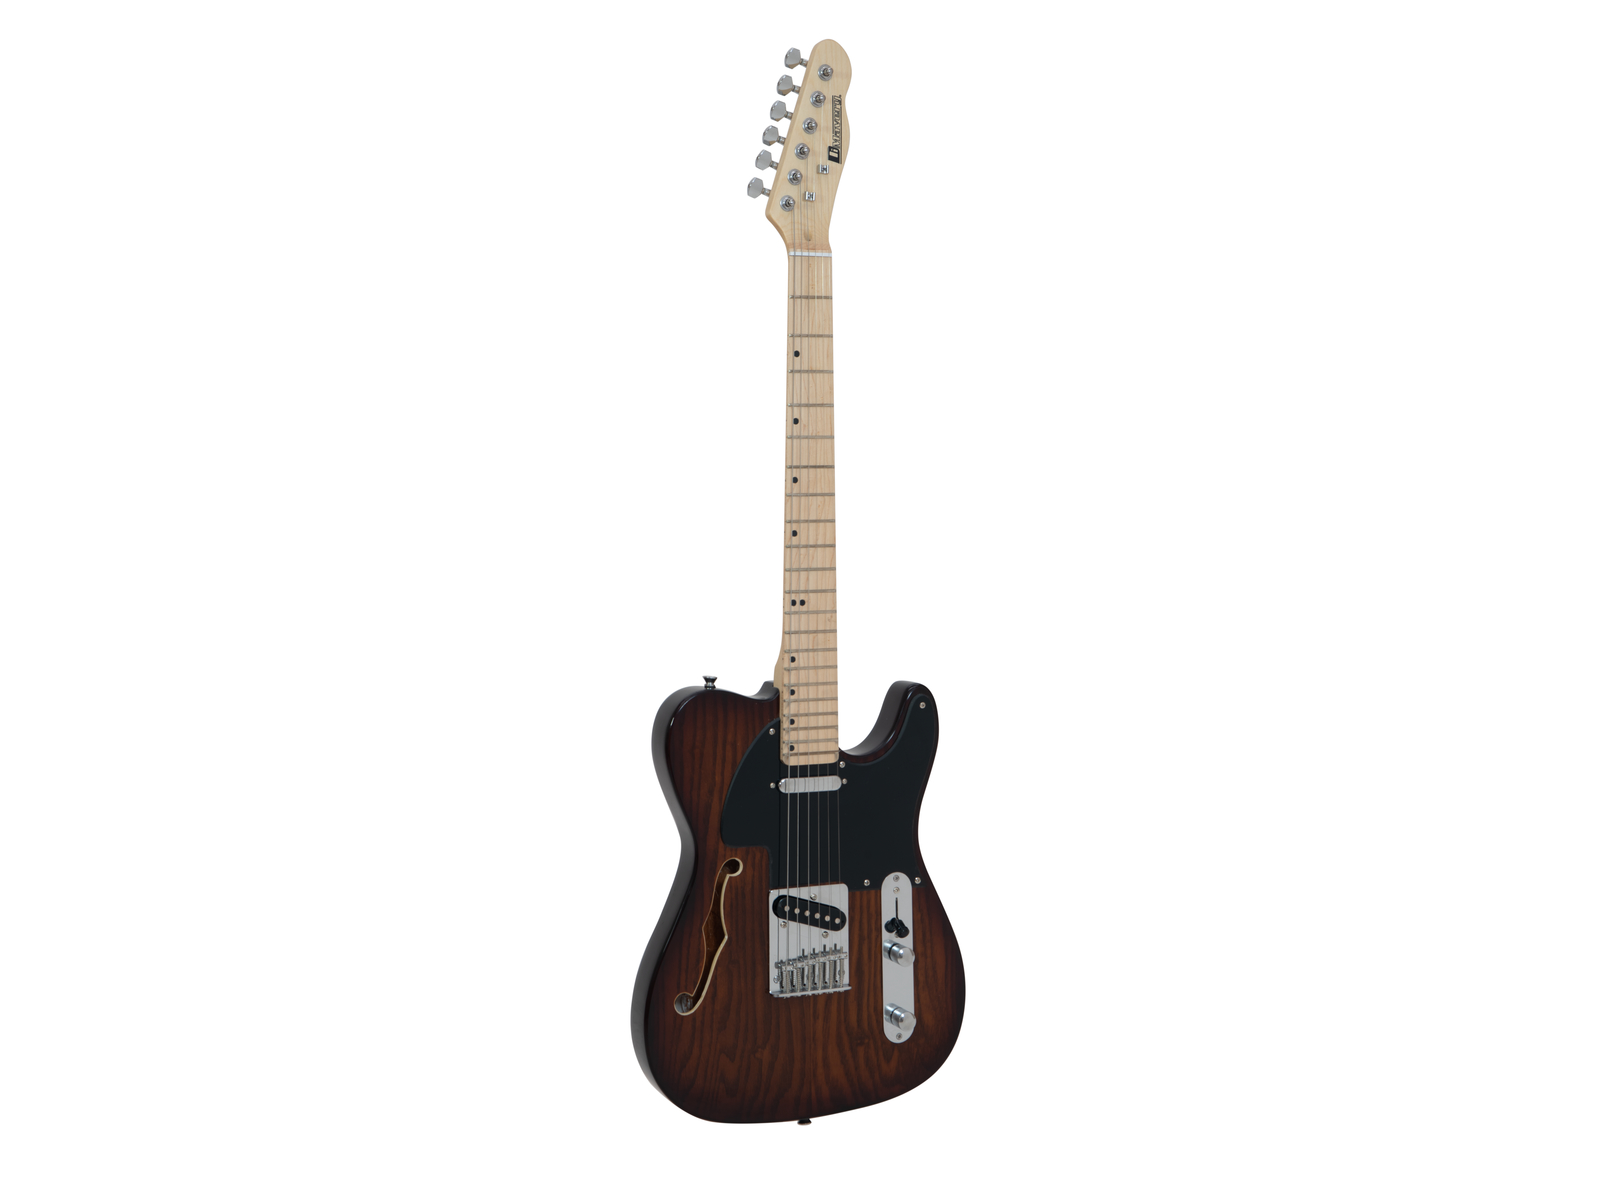 dimavery-tl-501-thinline-e-gitarre